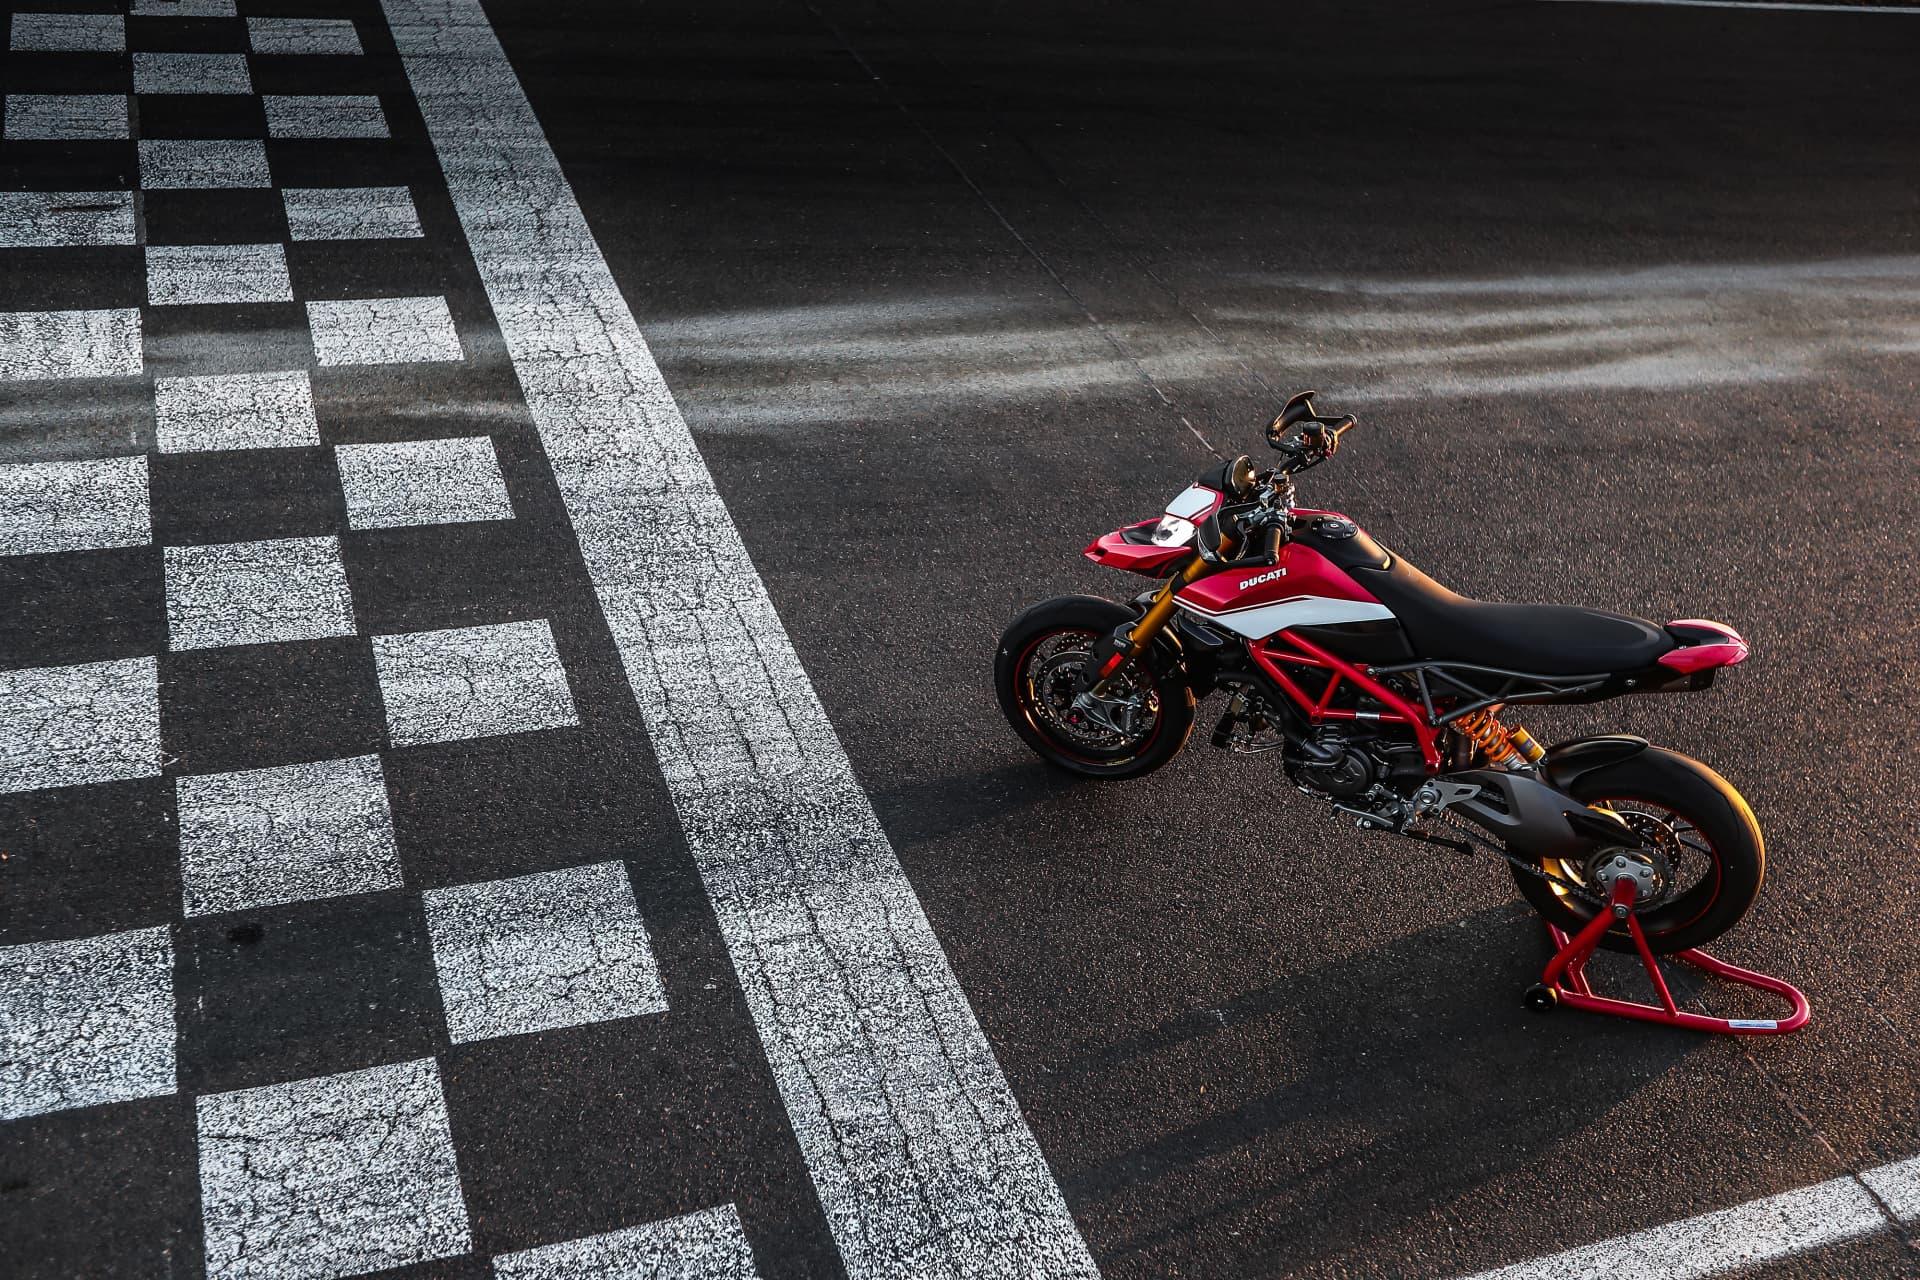 Ducati Hypermotard 950 Sp Static 00 Uc70302 Mid